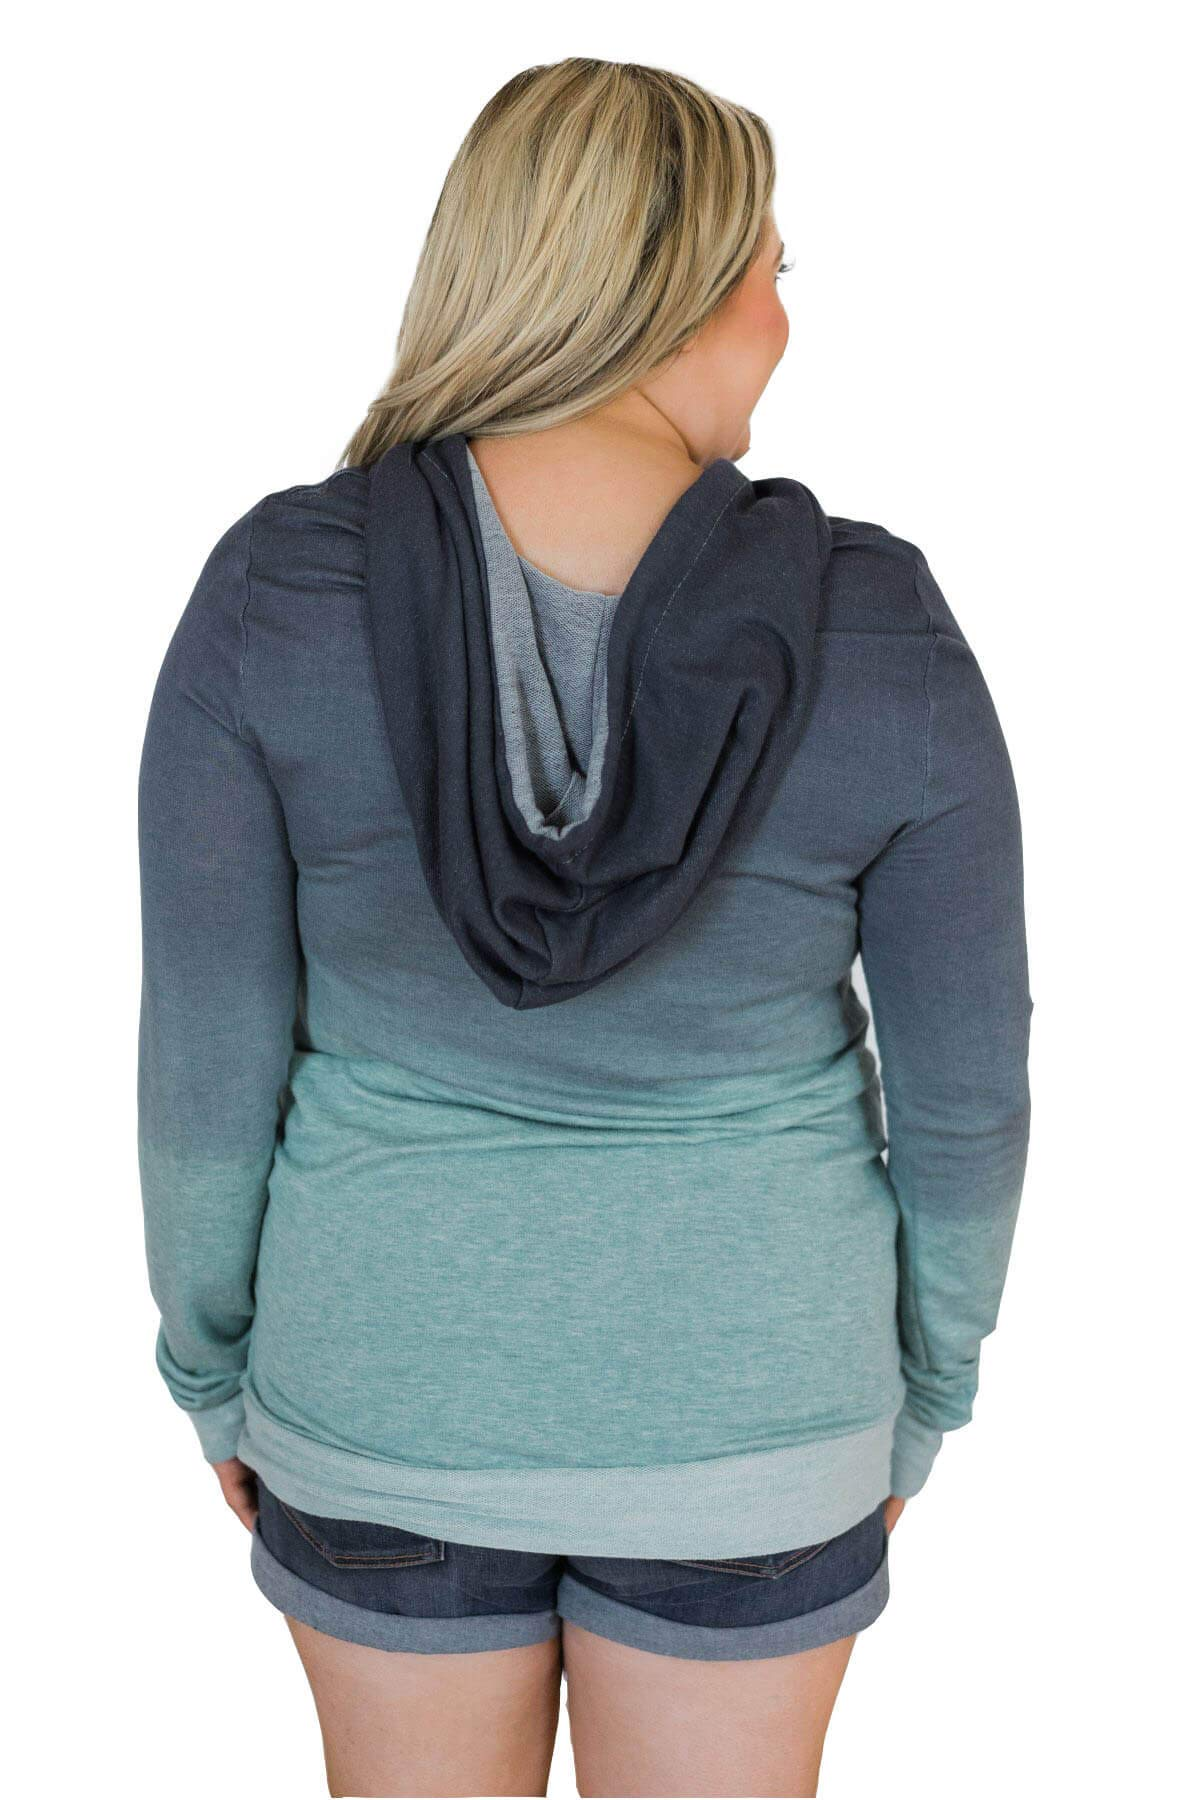 Minipeach Women's Pullover Long Sleeve Hoodies Coat Loose Casual Sweatshirts with Pocket by Minipeach (Image #5)